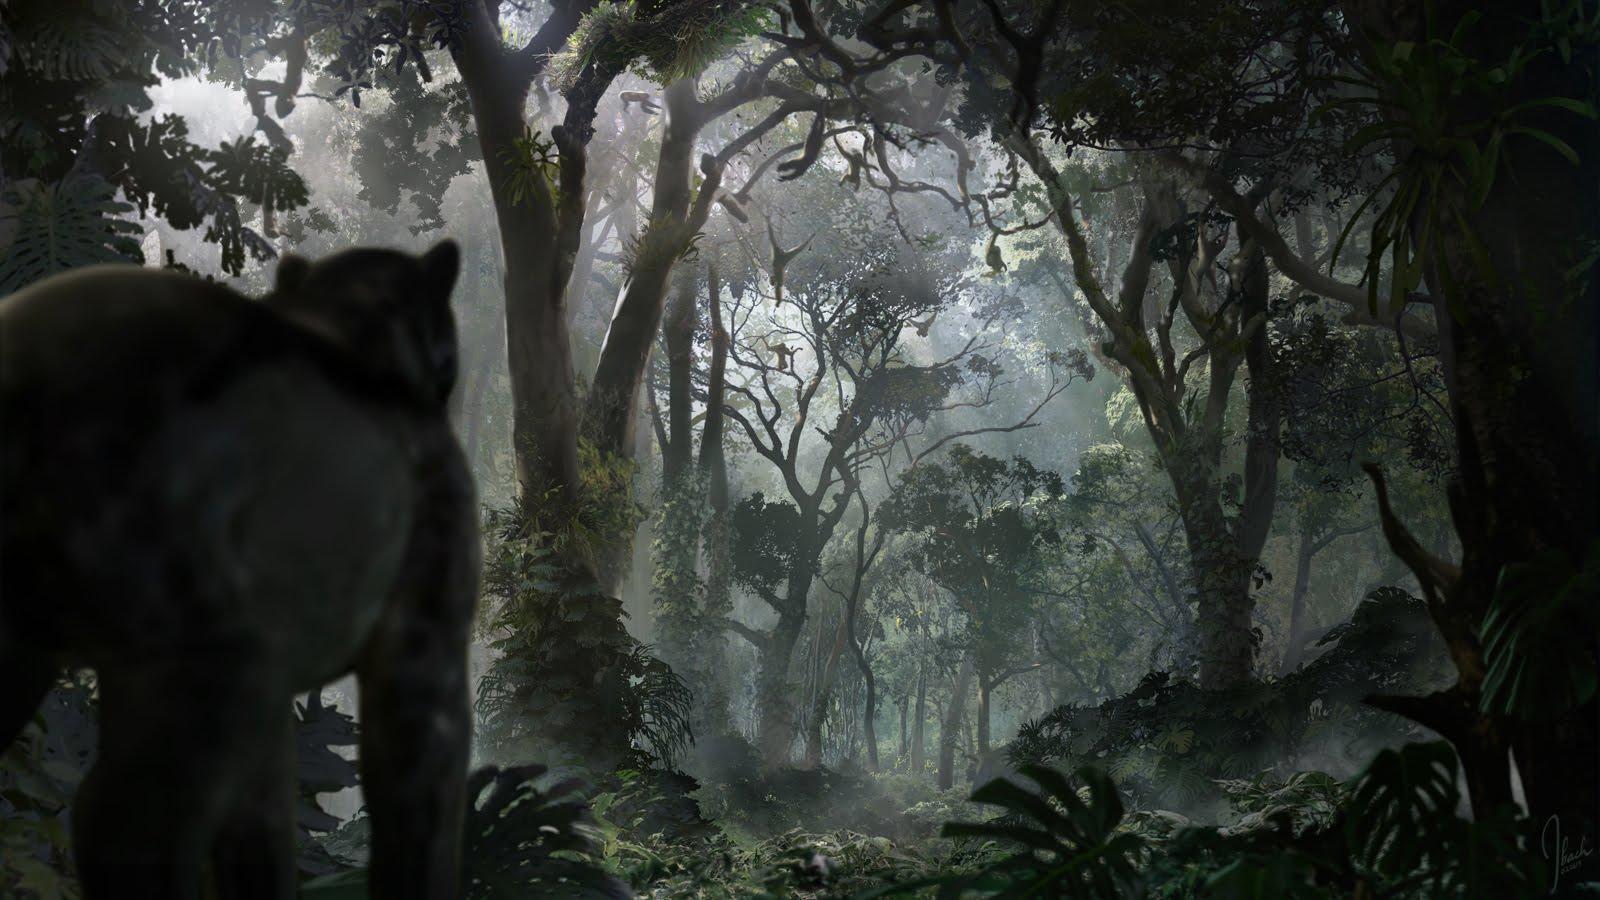 《奇幻森林》原画流出